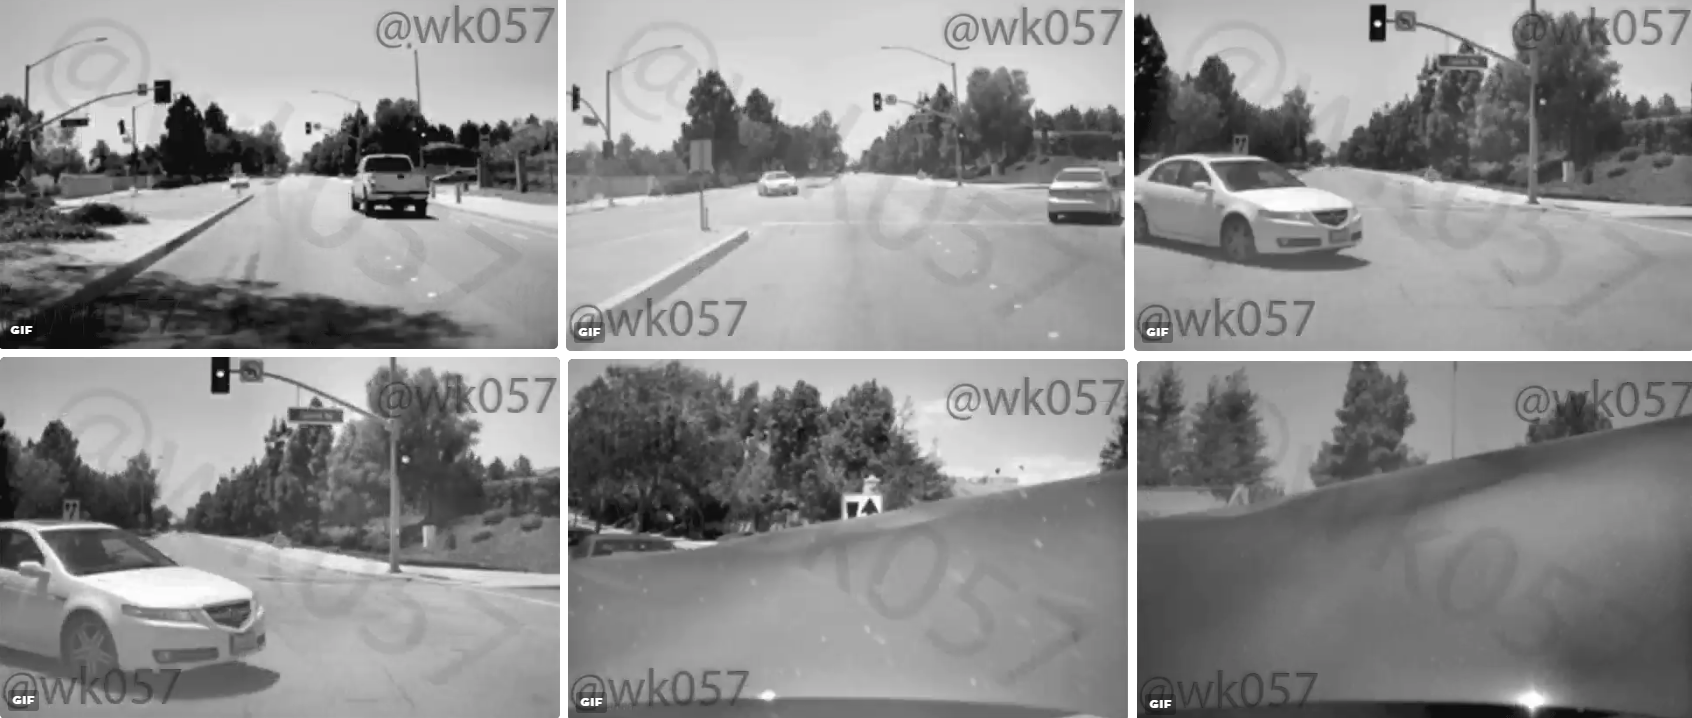 tesla-autopilot-camera-dashcam-wk057